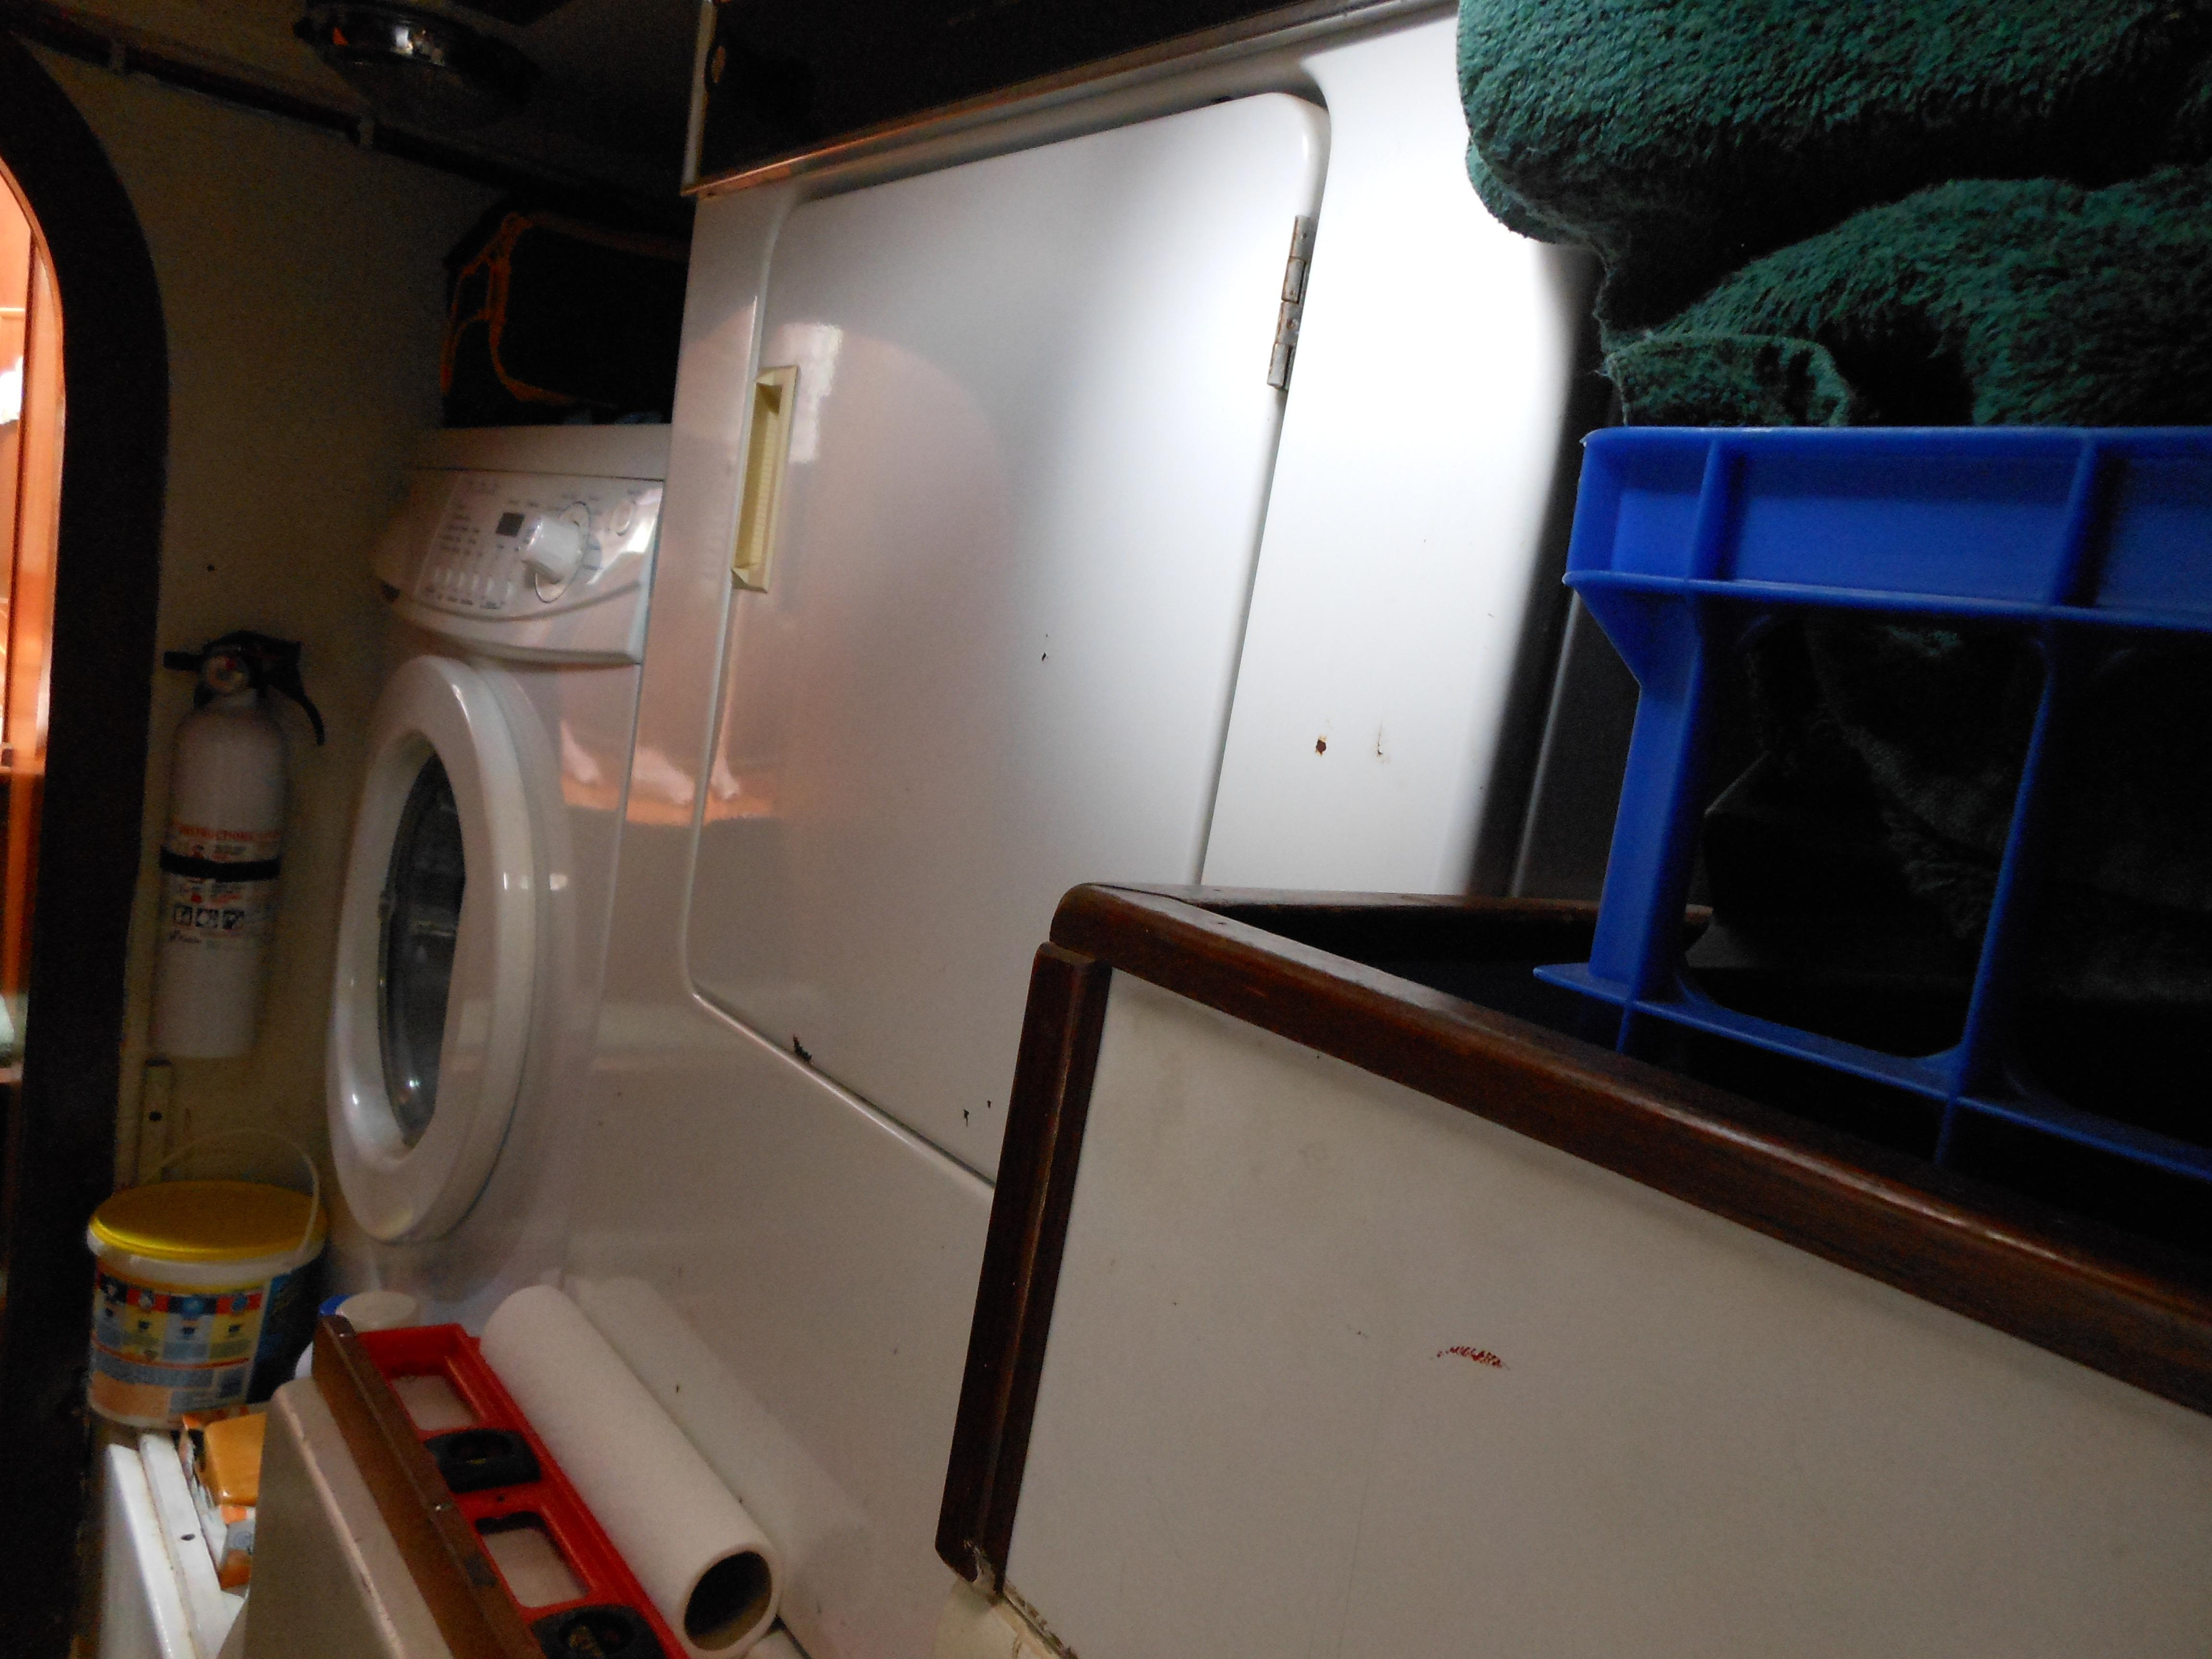 57 Wellington Apartment size washer - dryer